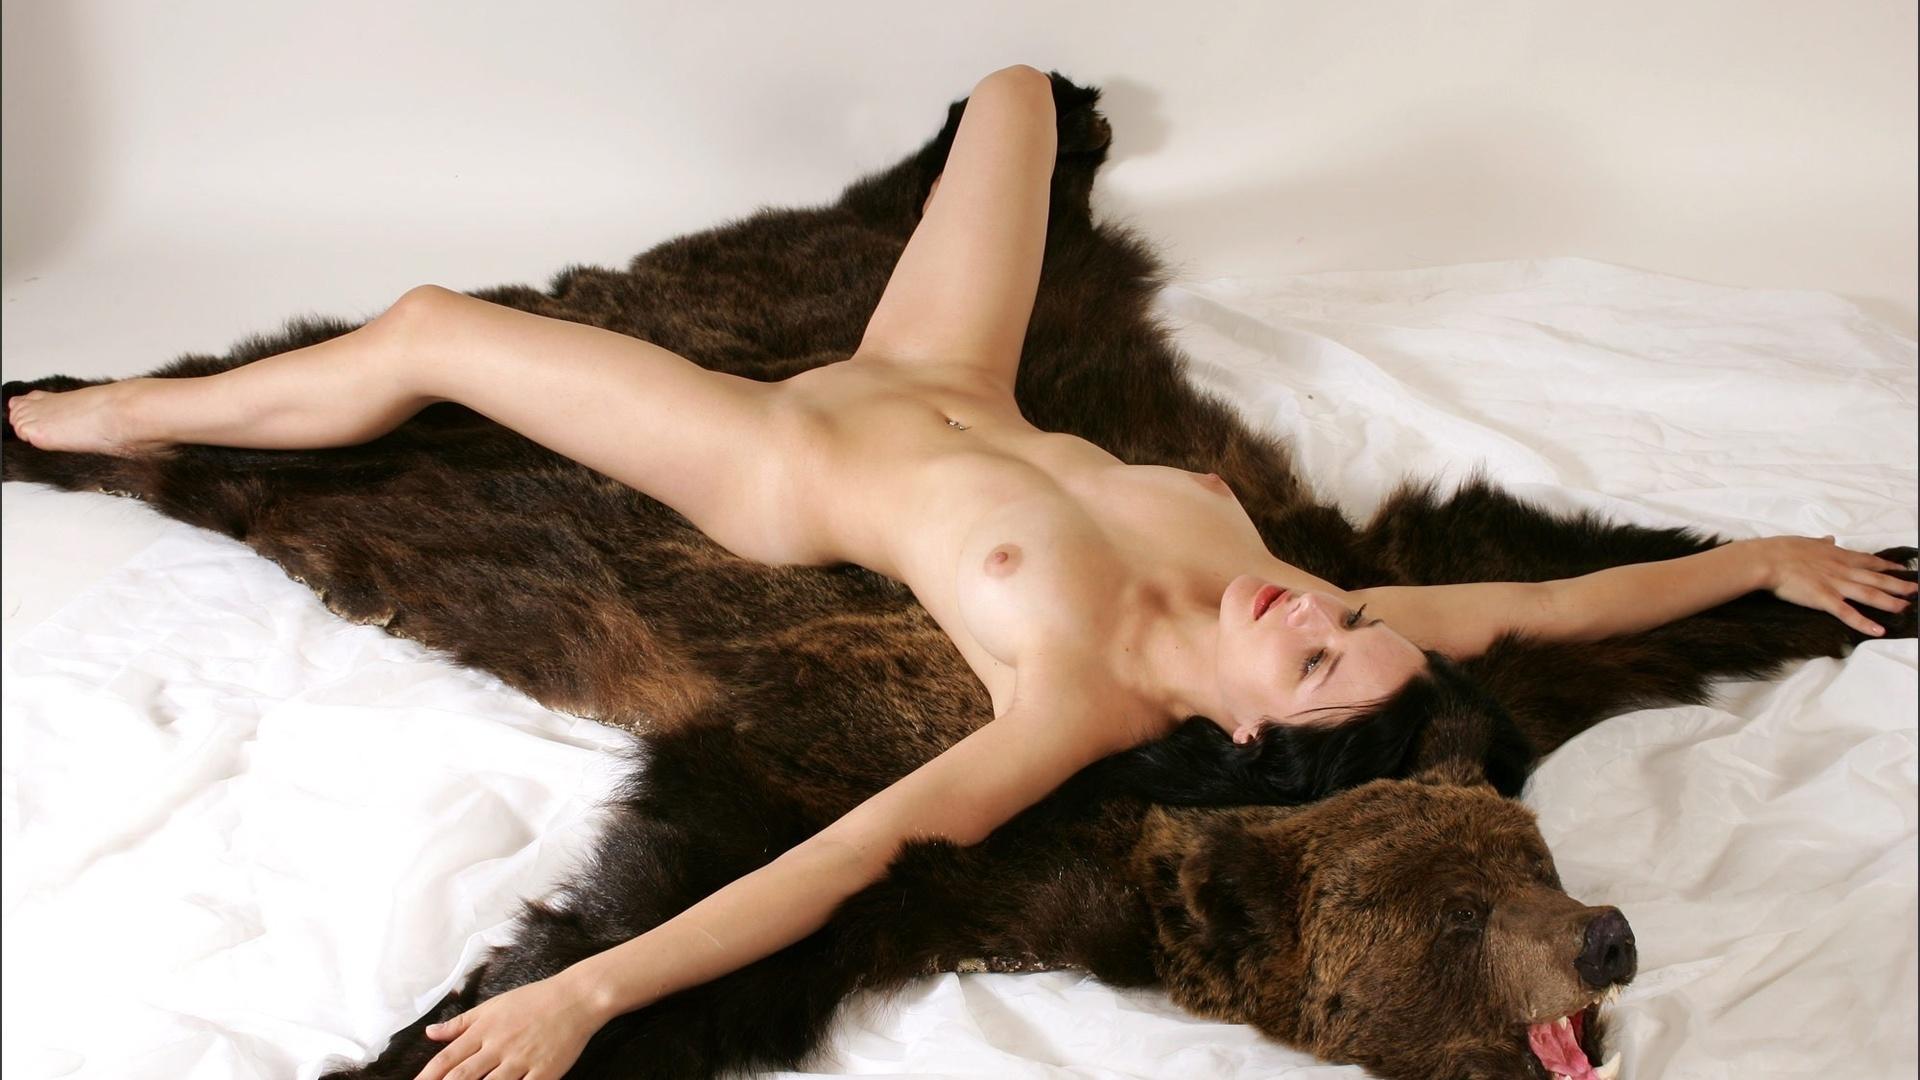 Фото секс на шкуре 2 фотография